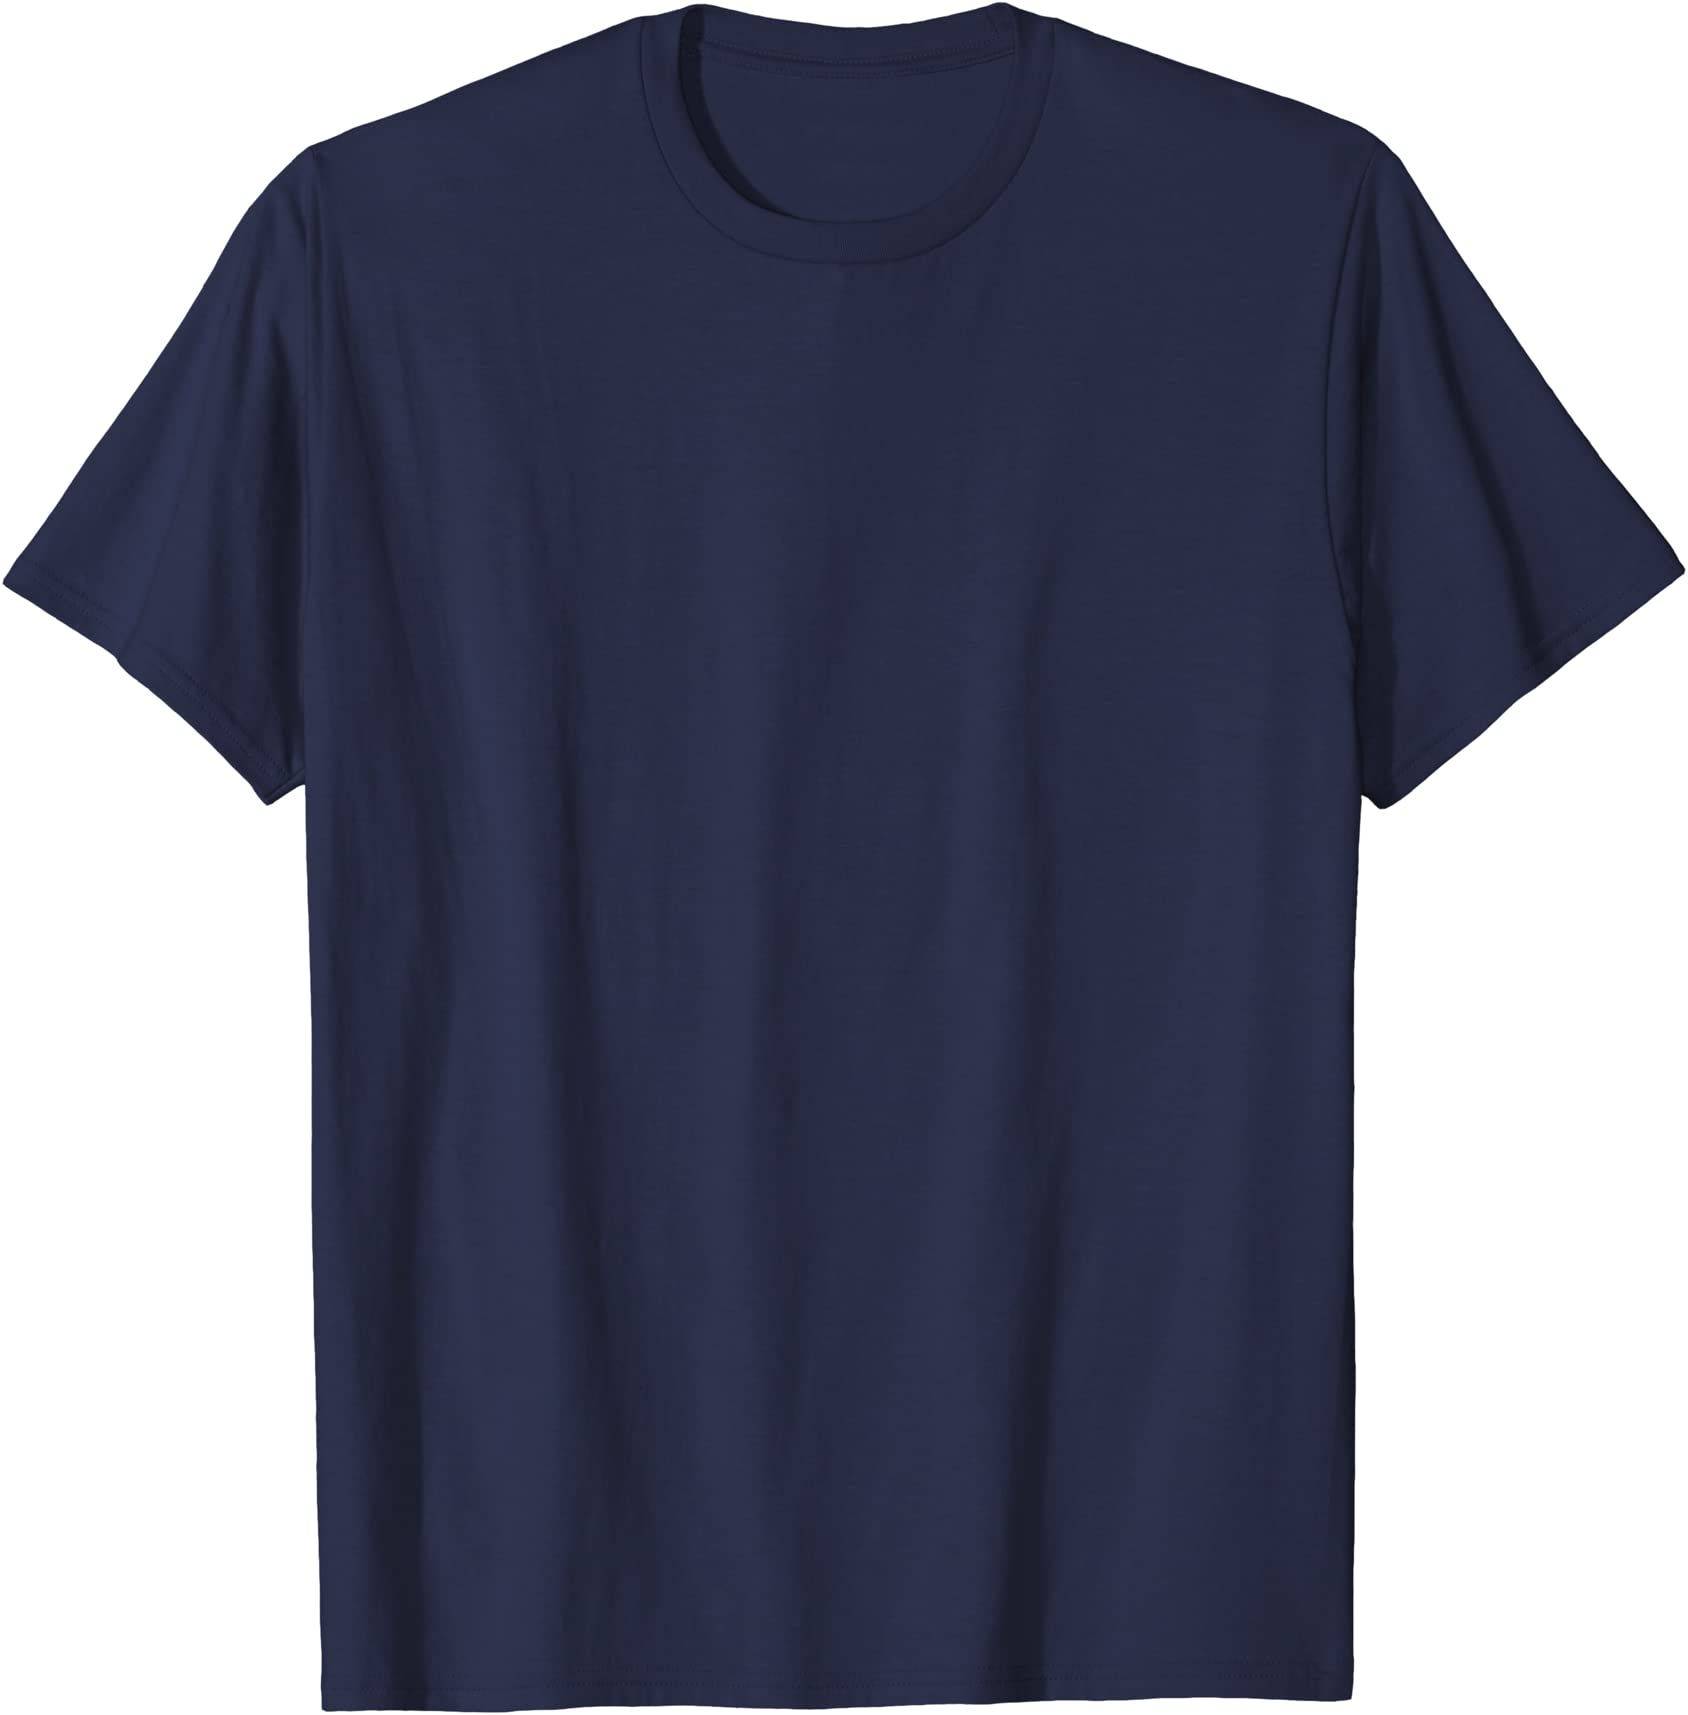 Self Harm Awareness Orange Ribbon Butterfly Short-Sleeve Unisex T-Shirt